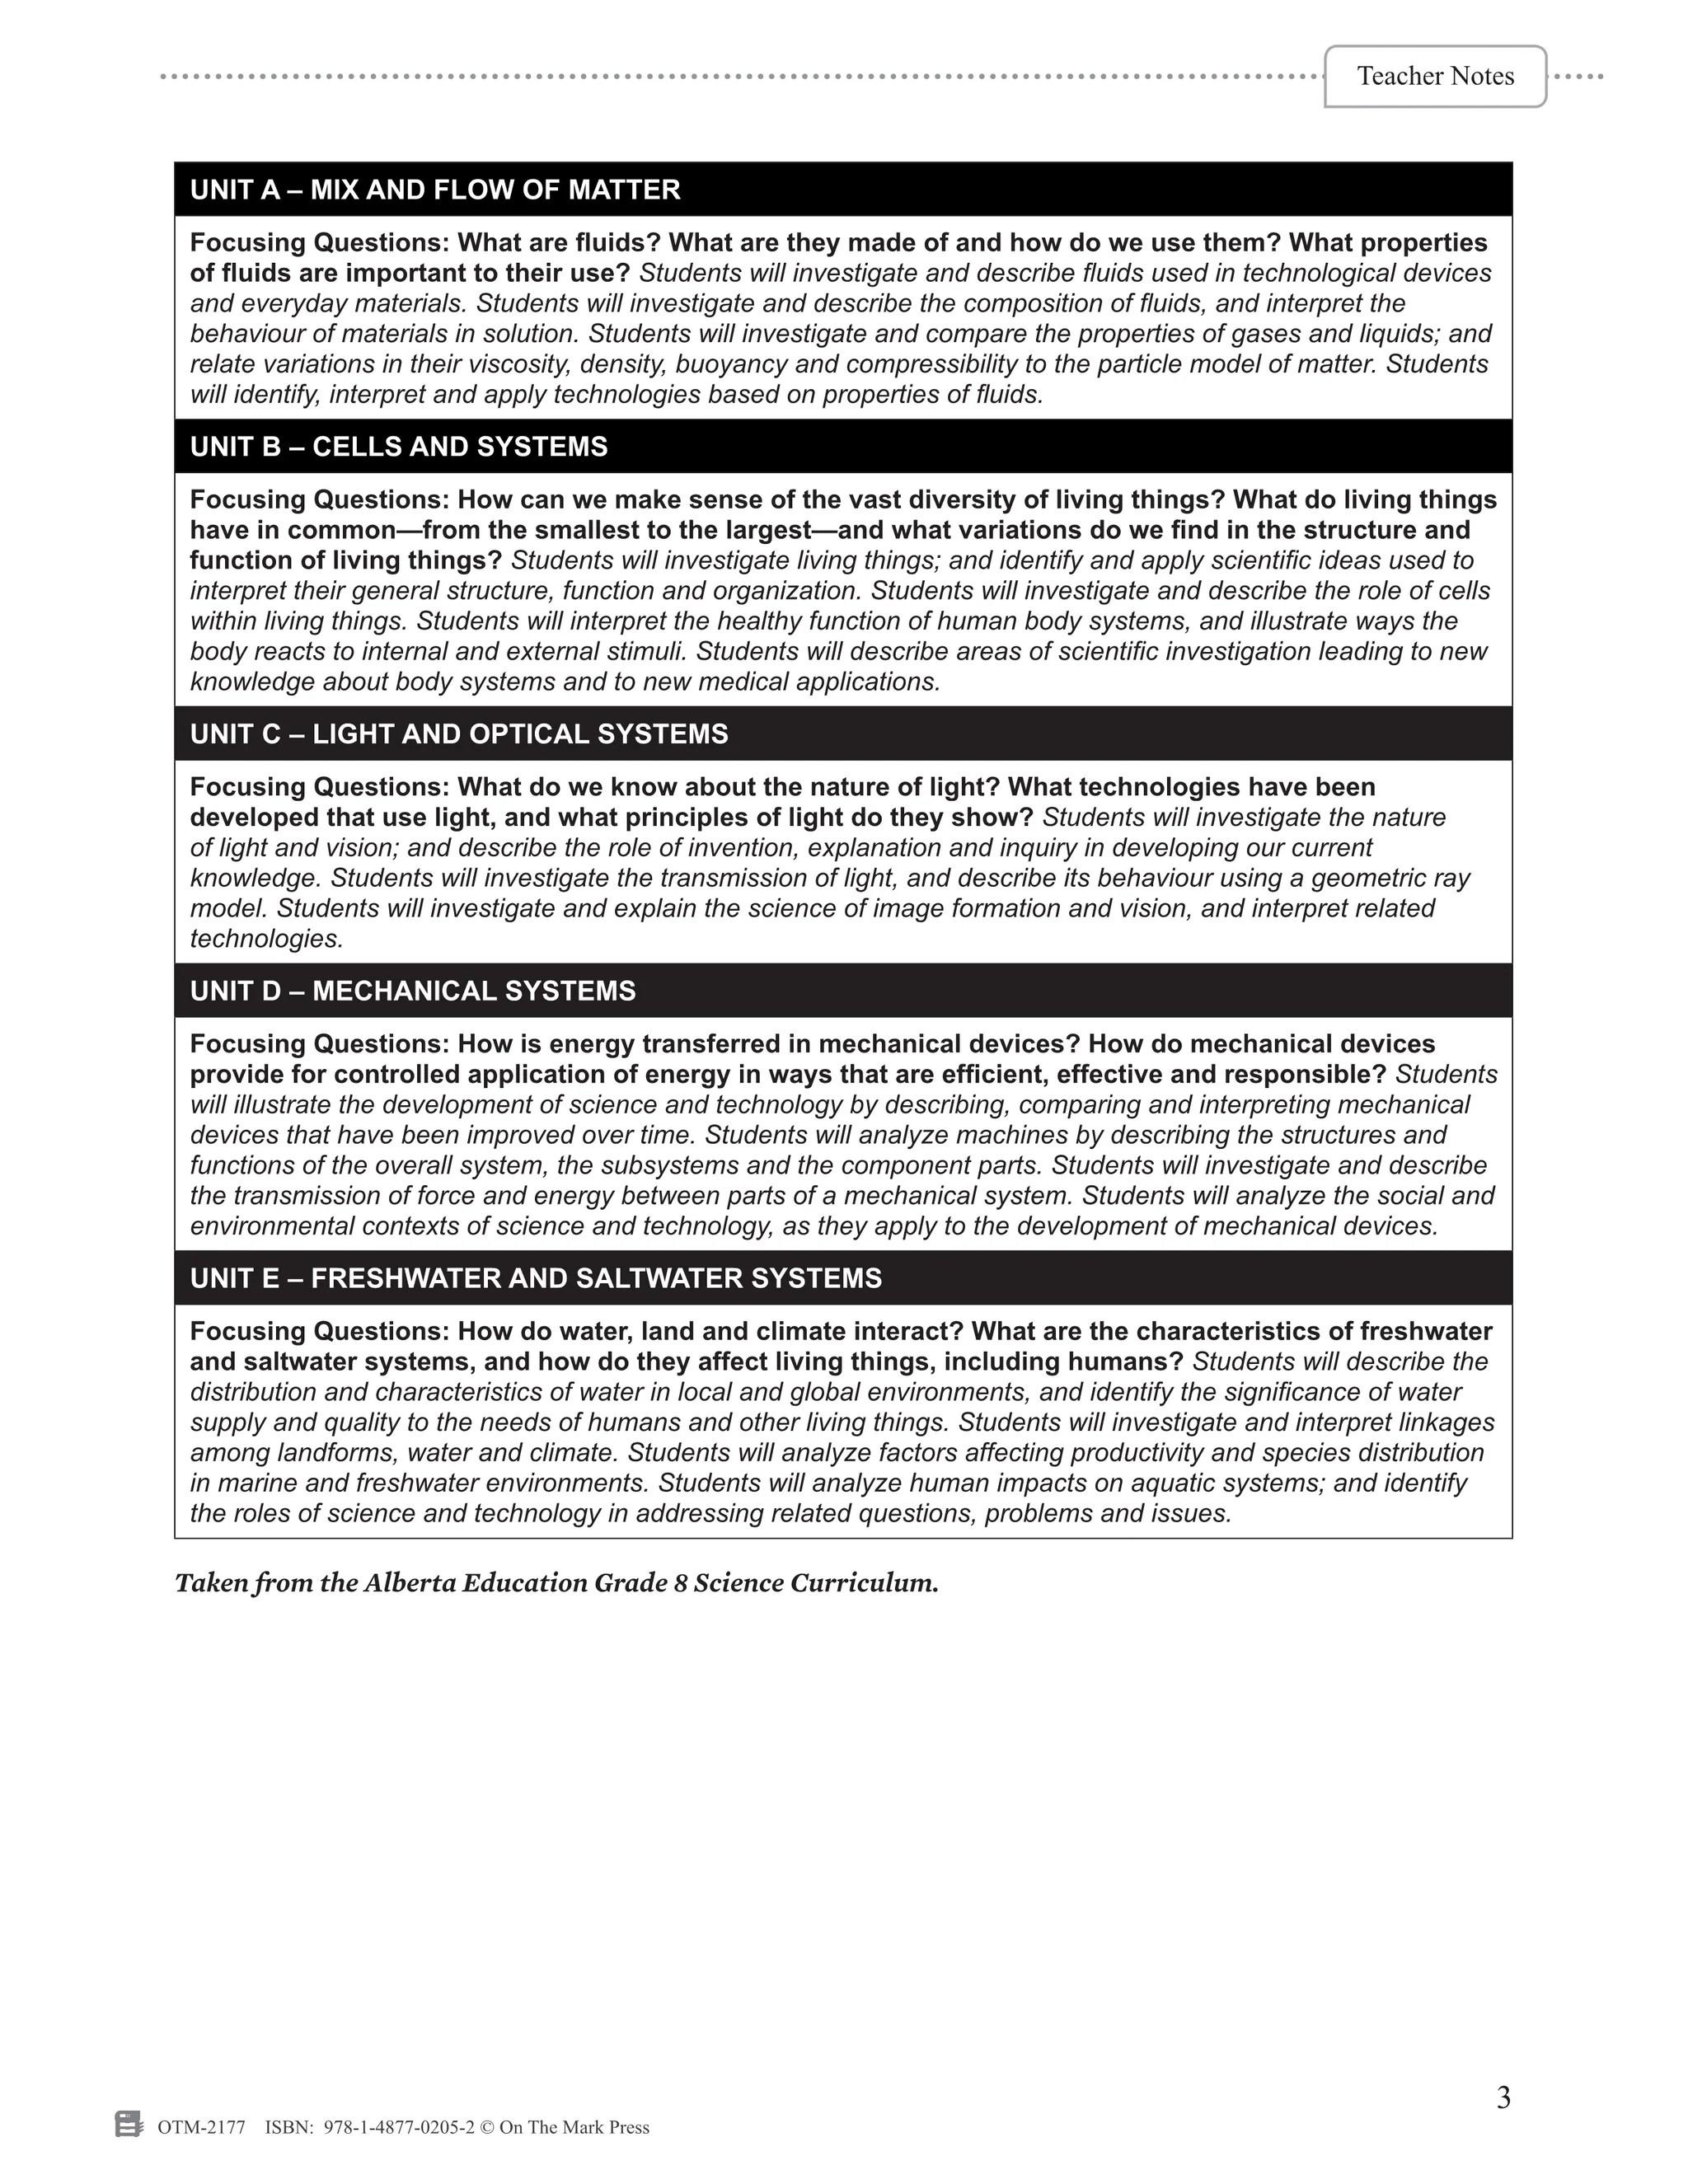 Alberta Grade 8 Science Curriculum - On The Mark Press [ 2650 x 2048 Pixel ]